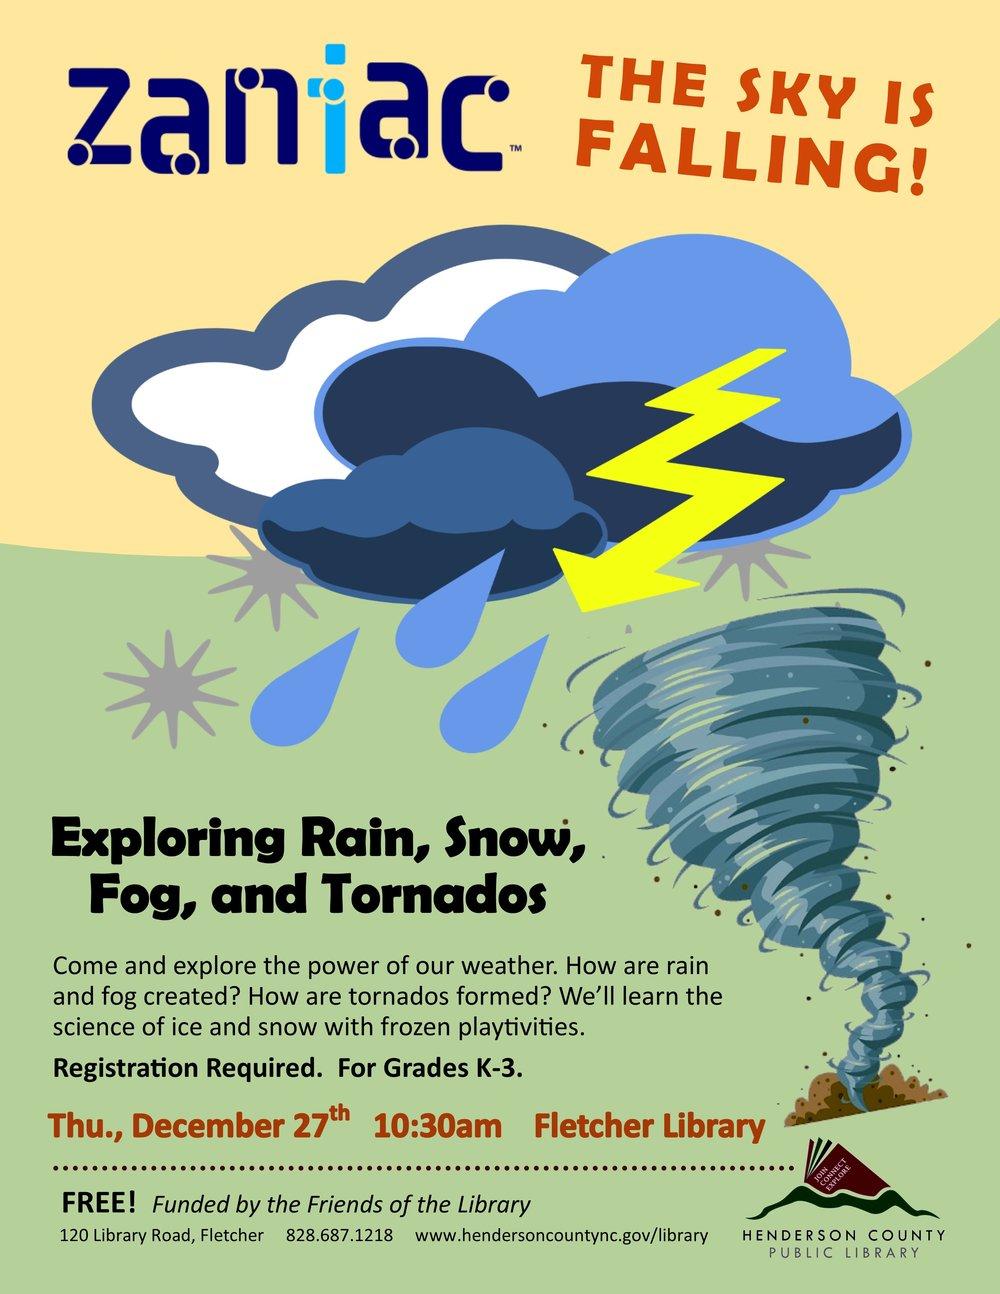 FL- Zaniac Sky is Falling (1).jpg